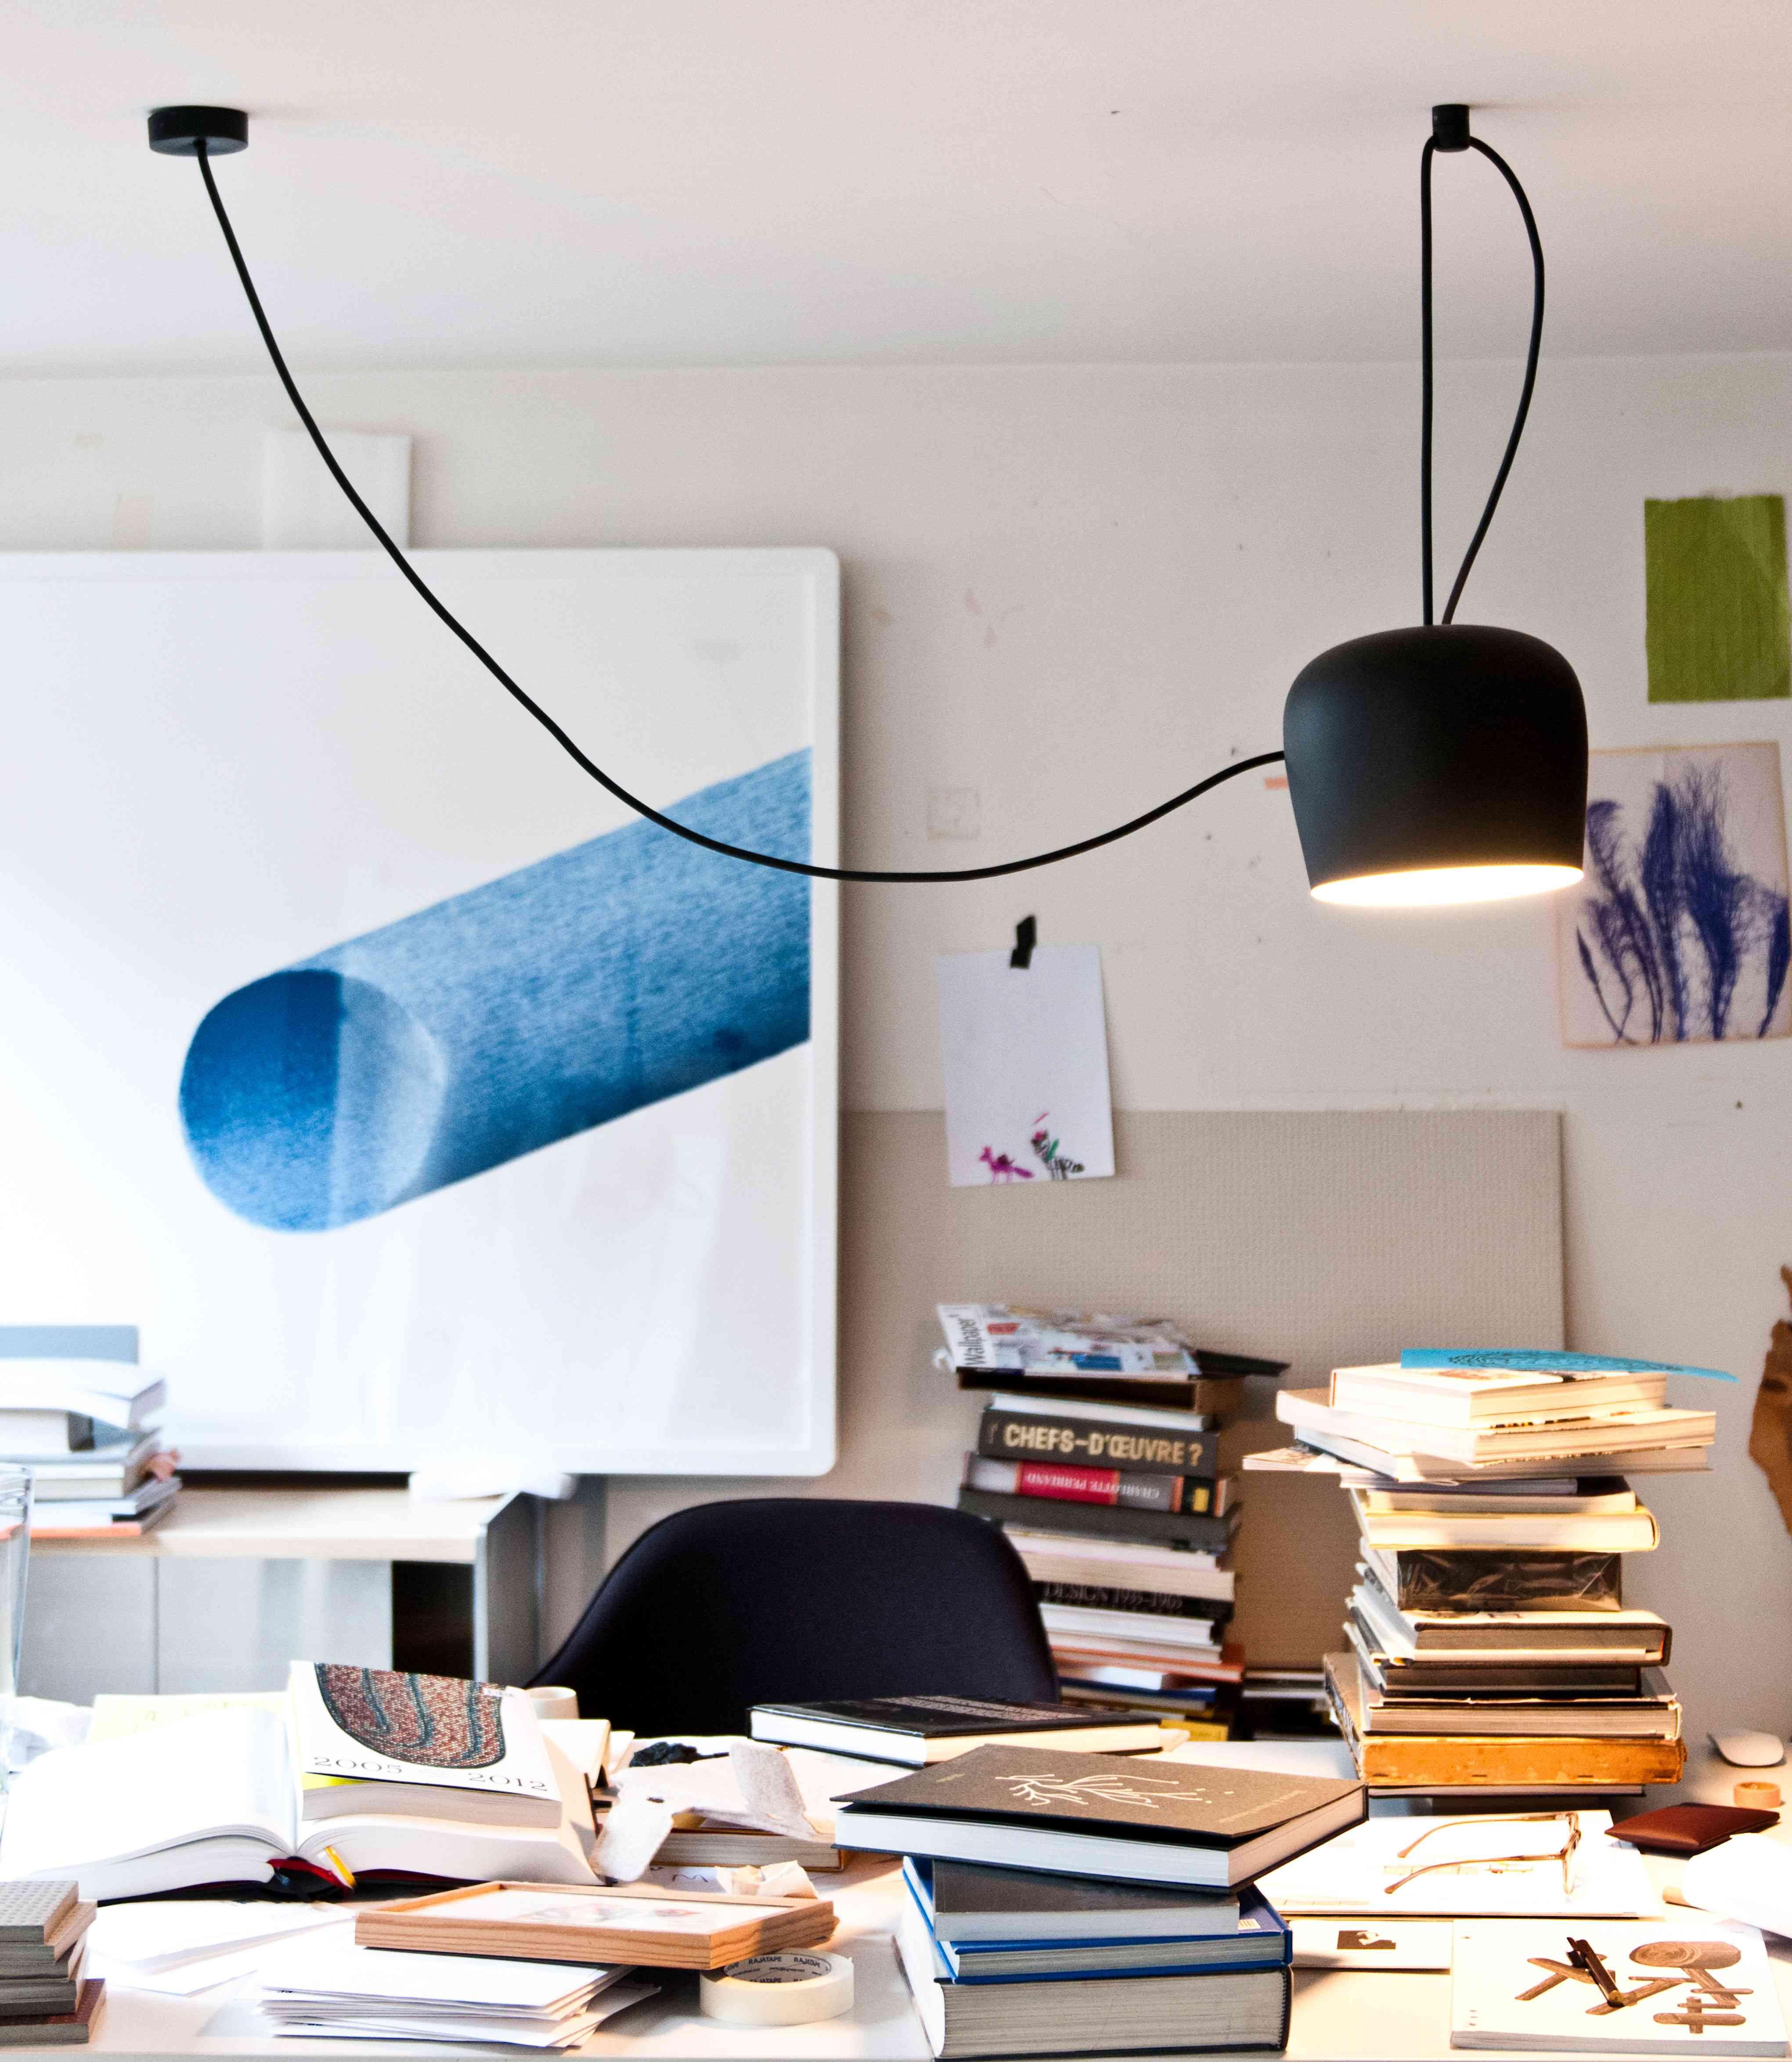 Aim Small Modern Office Lighting